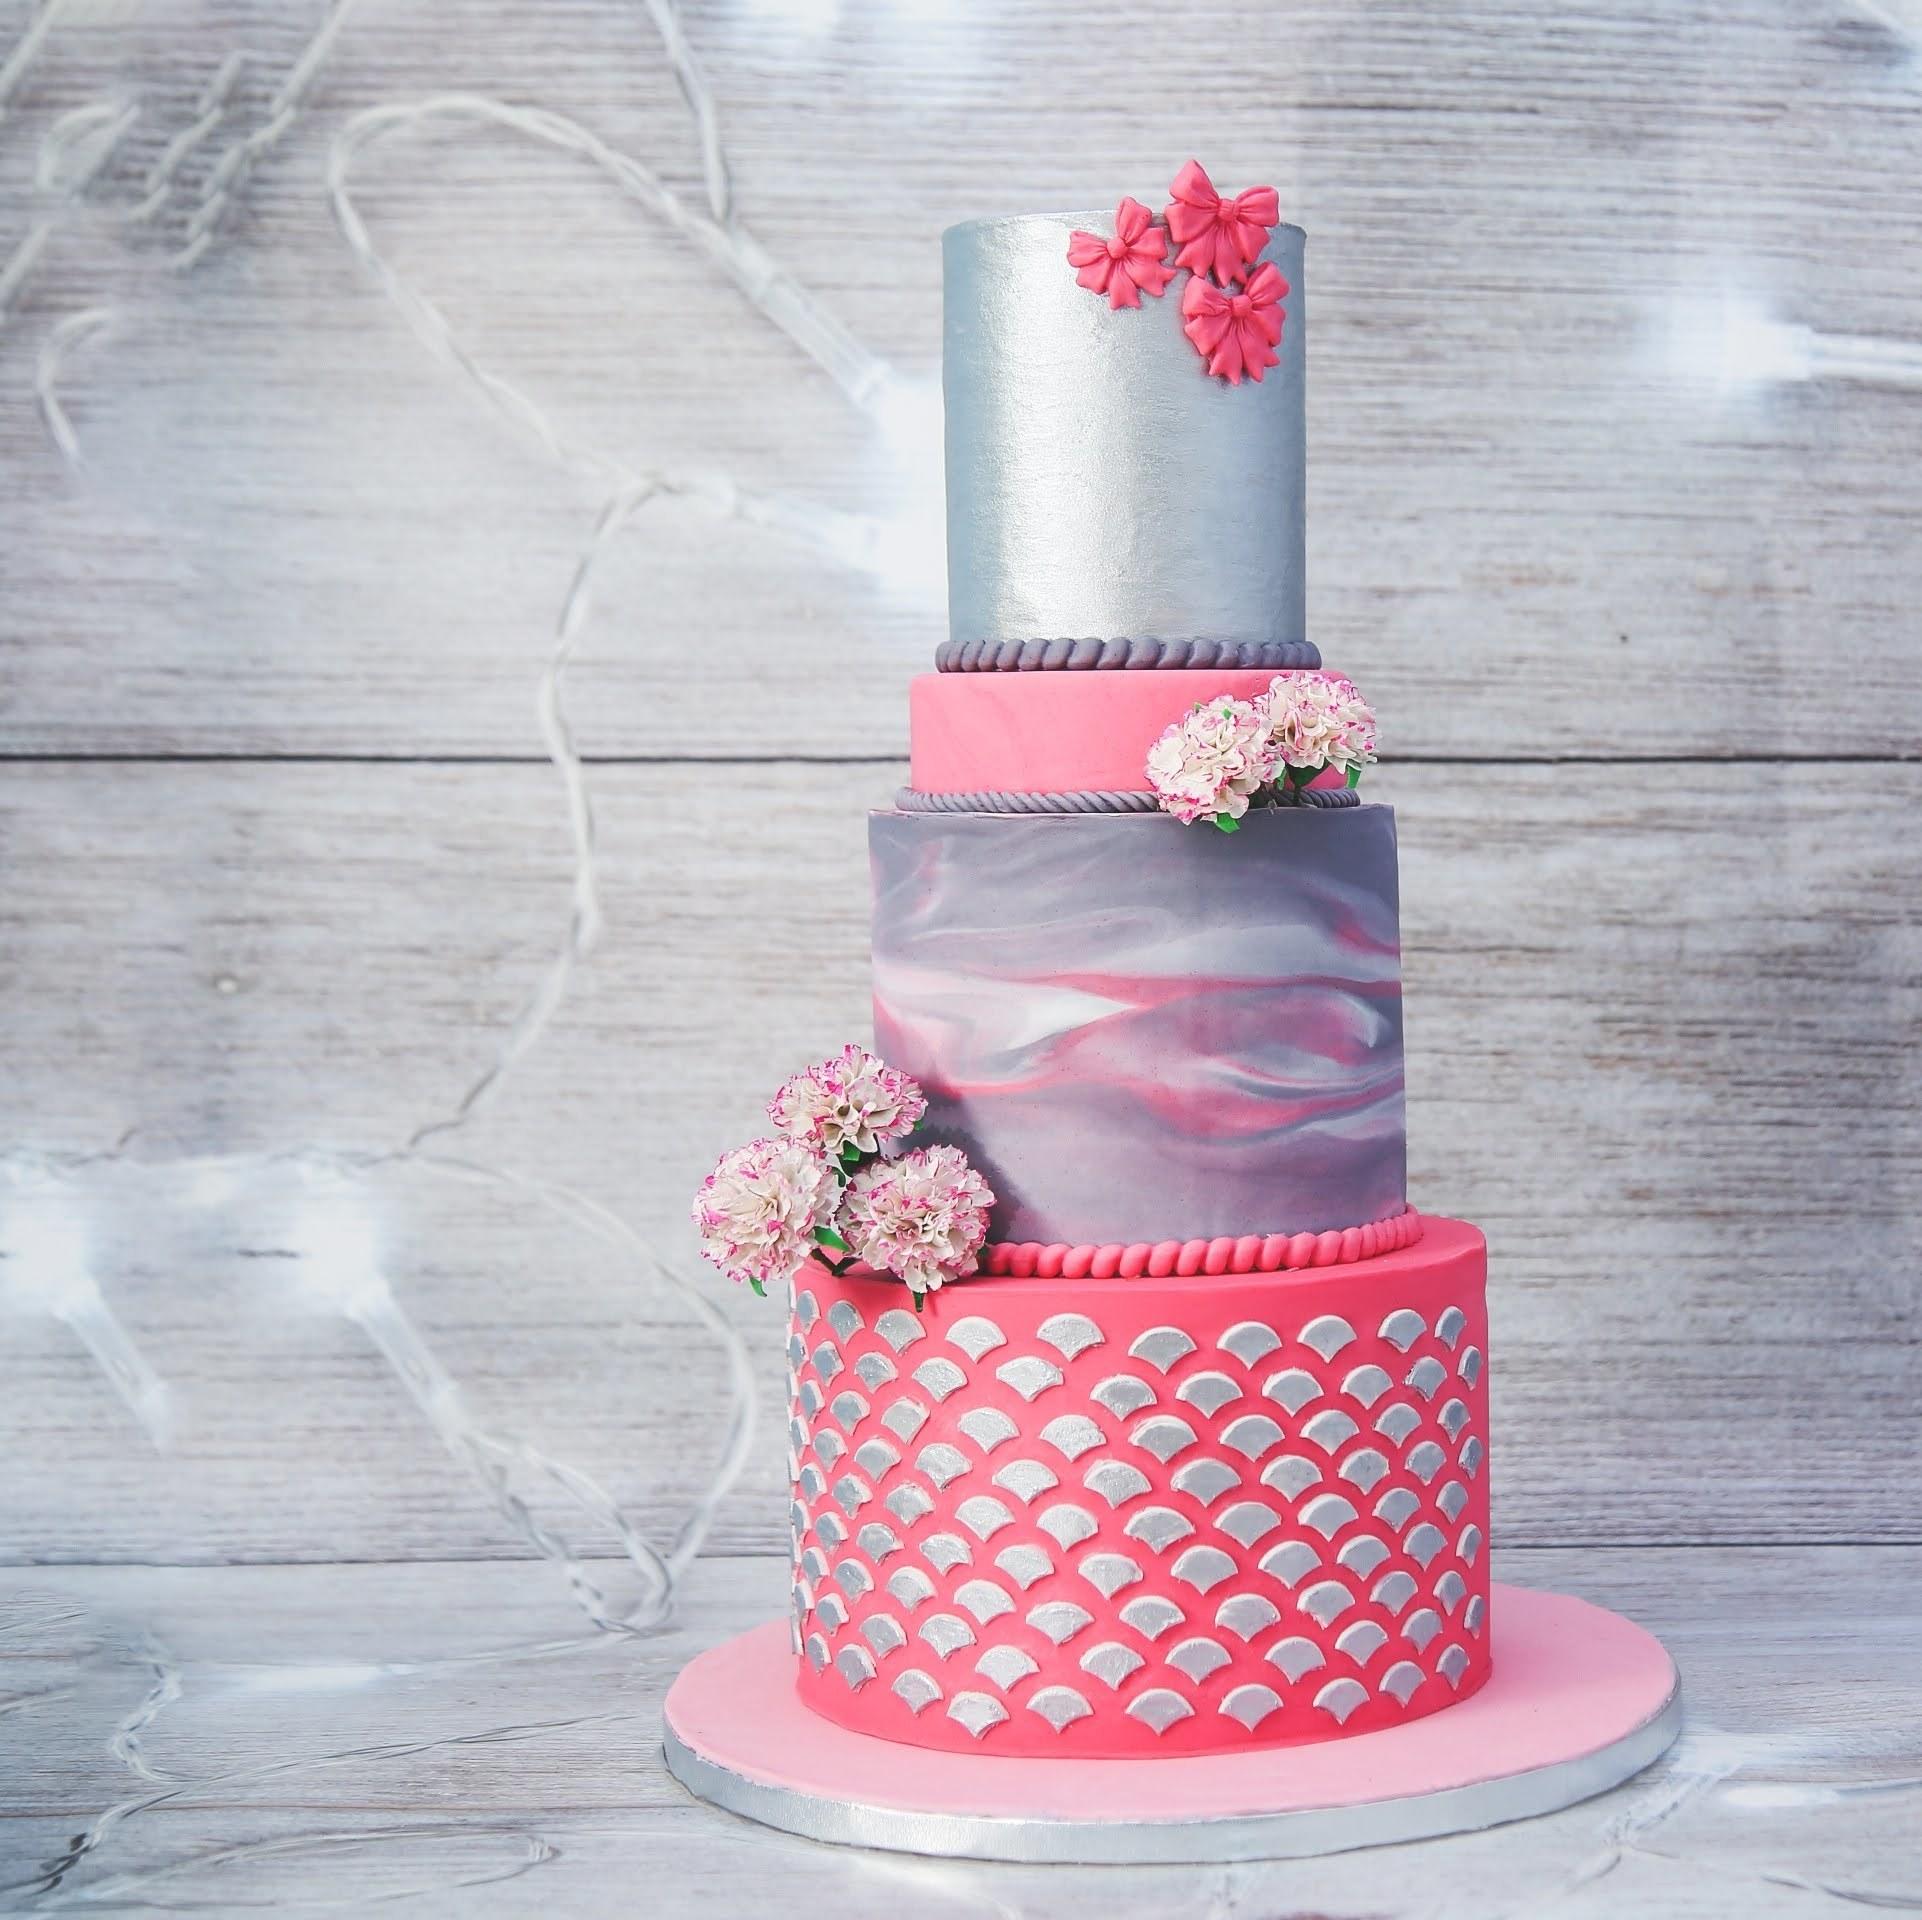 Light pink and white fondant wedding cake